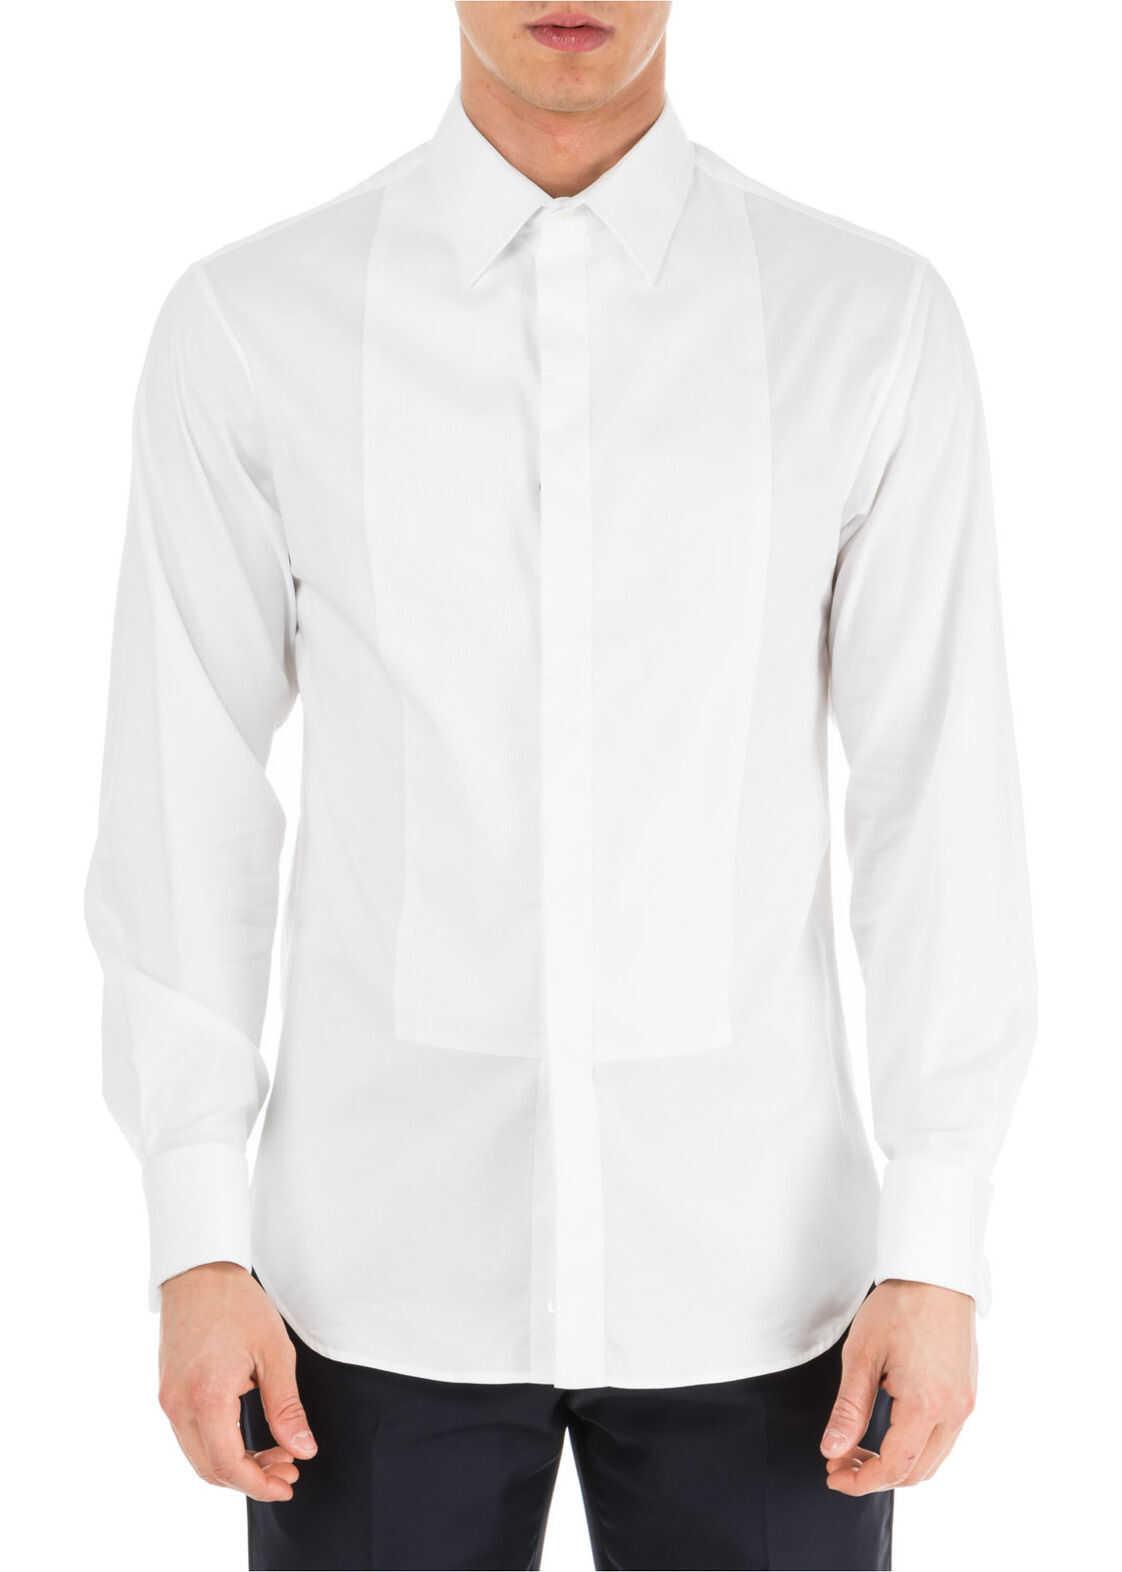 Emporio Armani Dress Shirt White